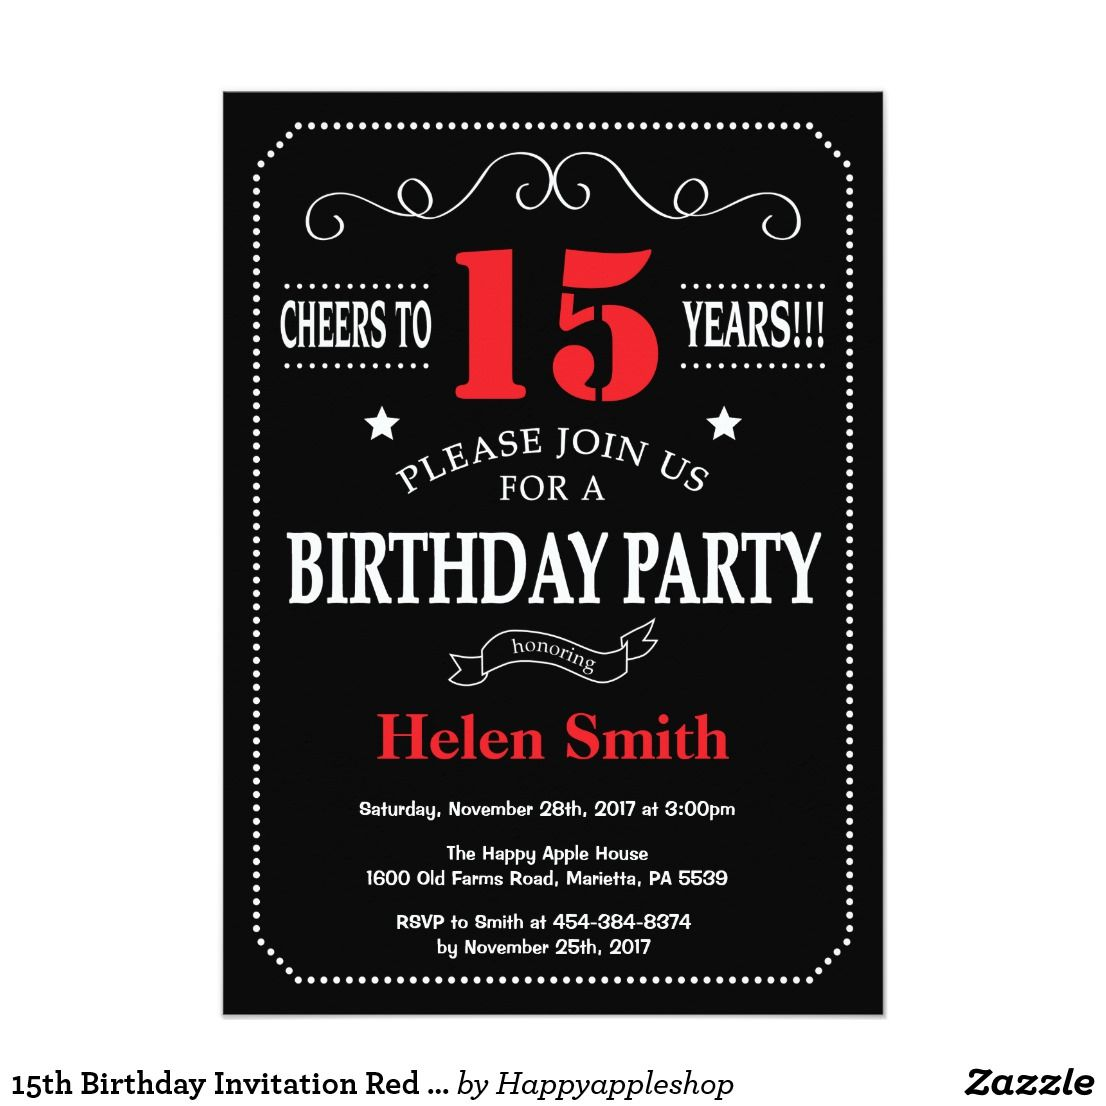 15th birthday invitation red and black